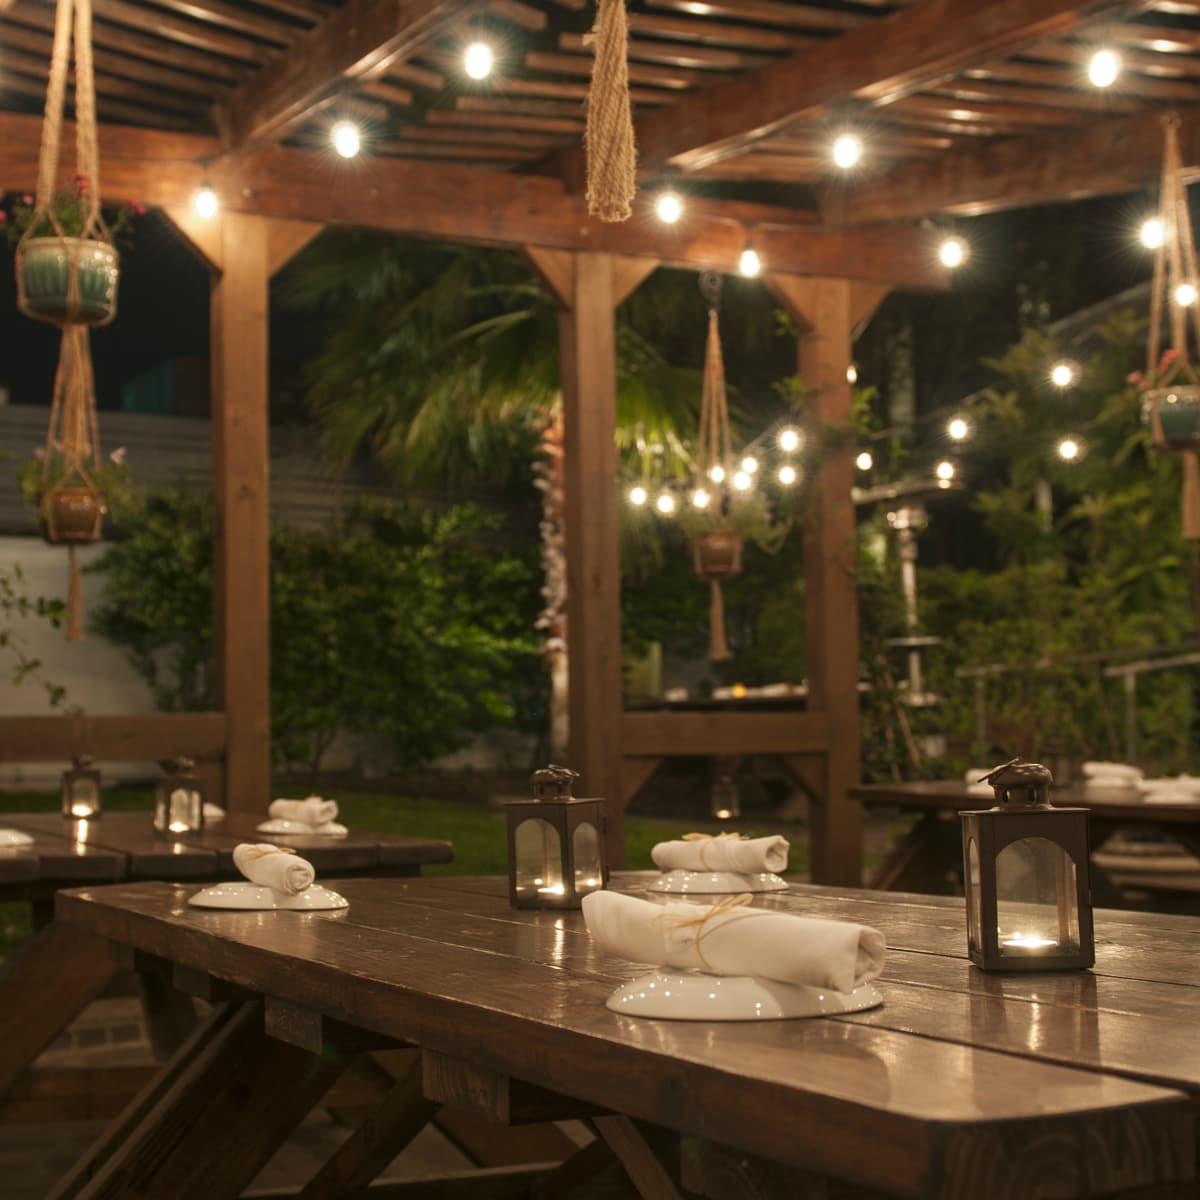 Cafe Josie Austin restaurant outside patio 2016